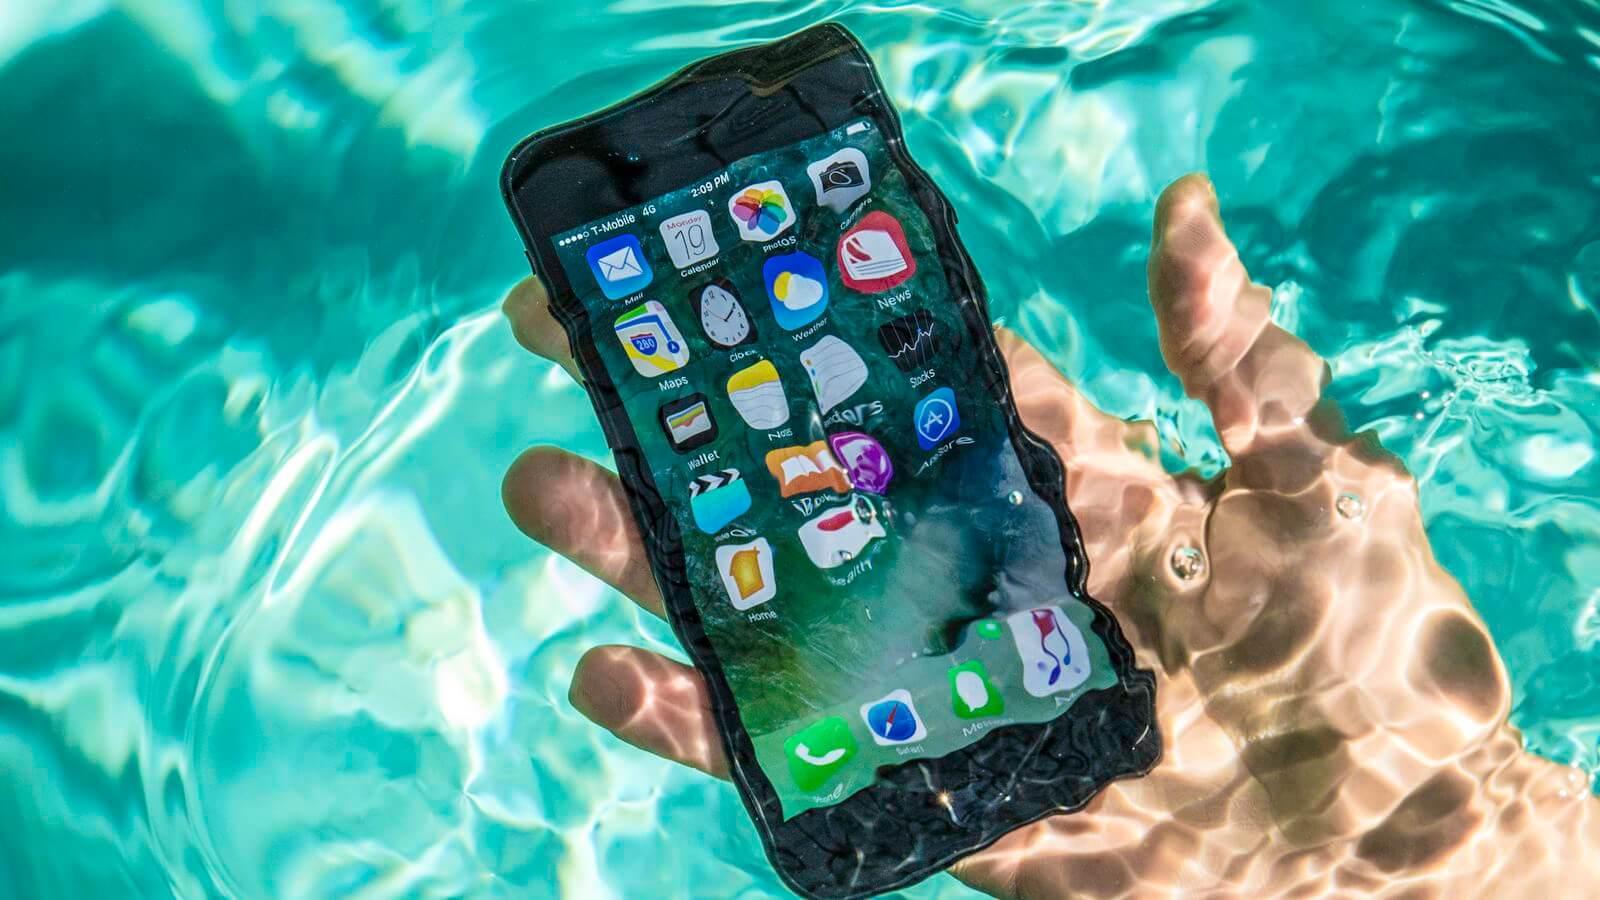 На Apple подали иск за преувеличение водонепроницаемости iPhone